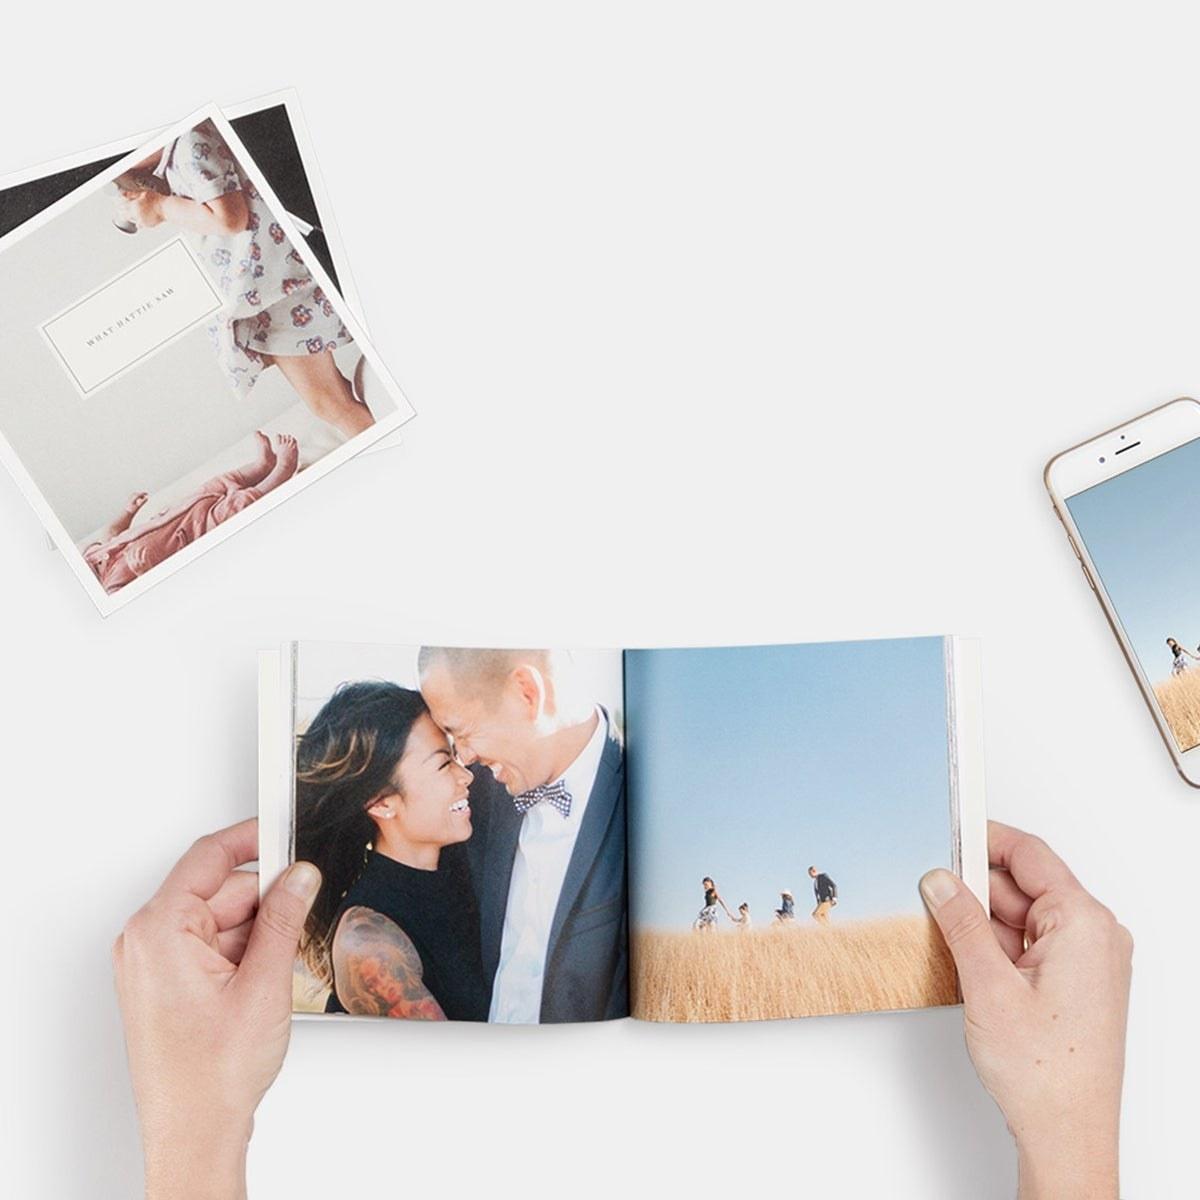 a model holding a small square photo album